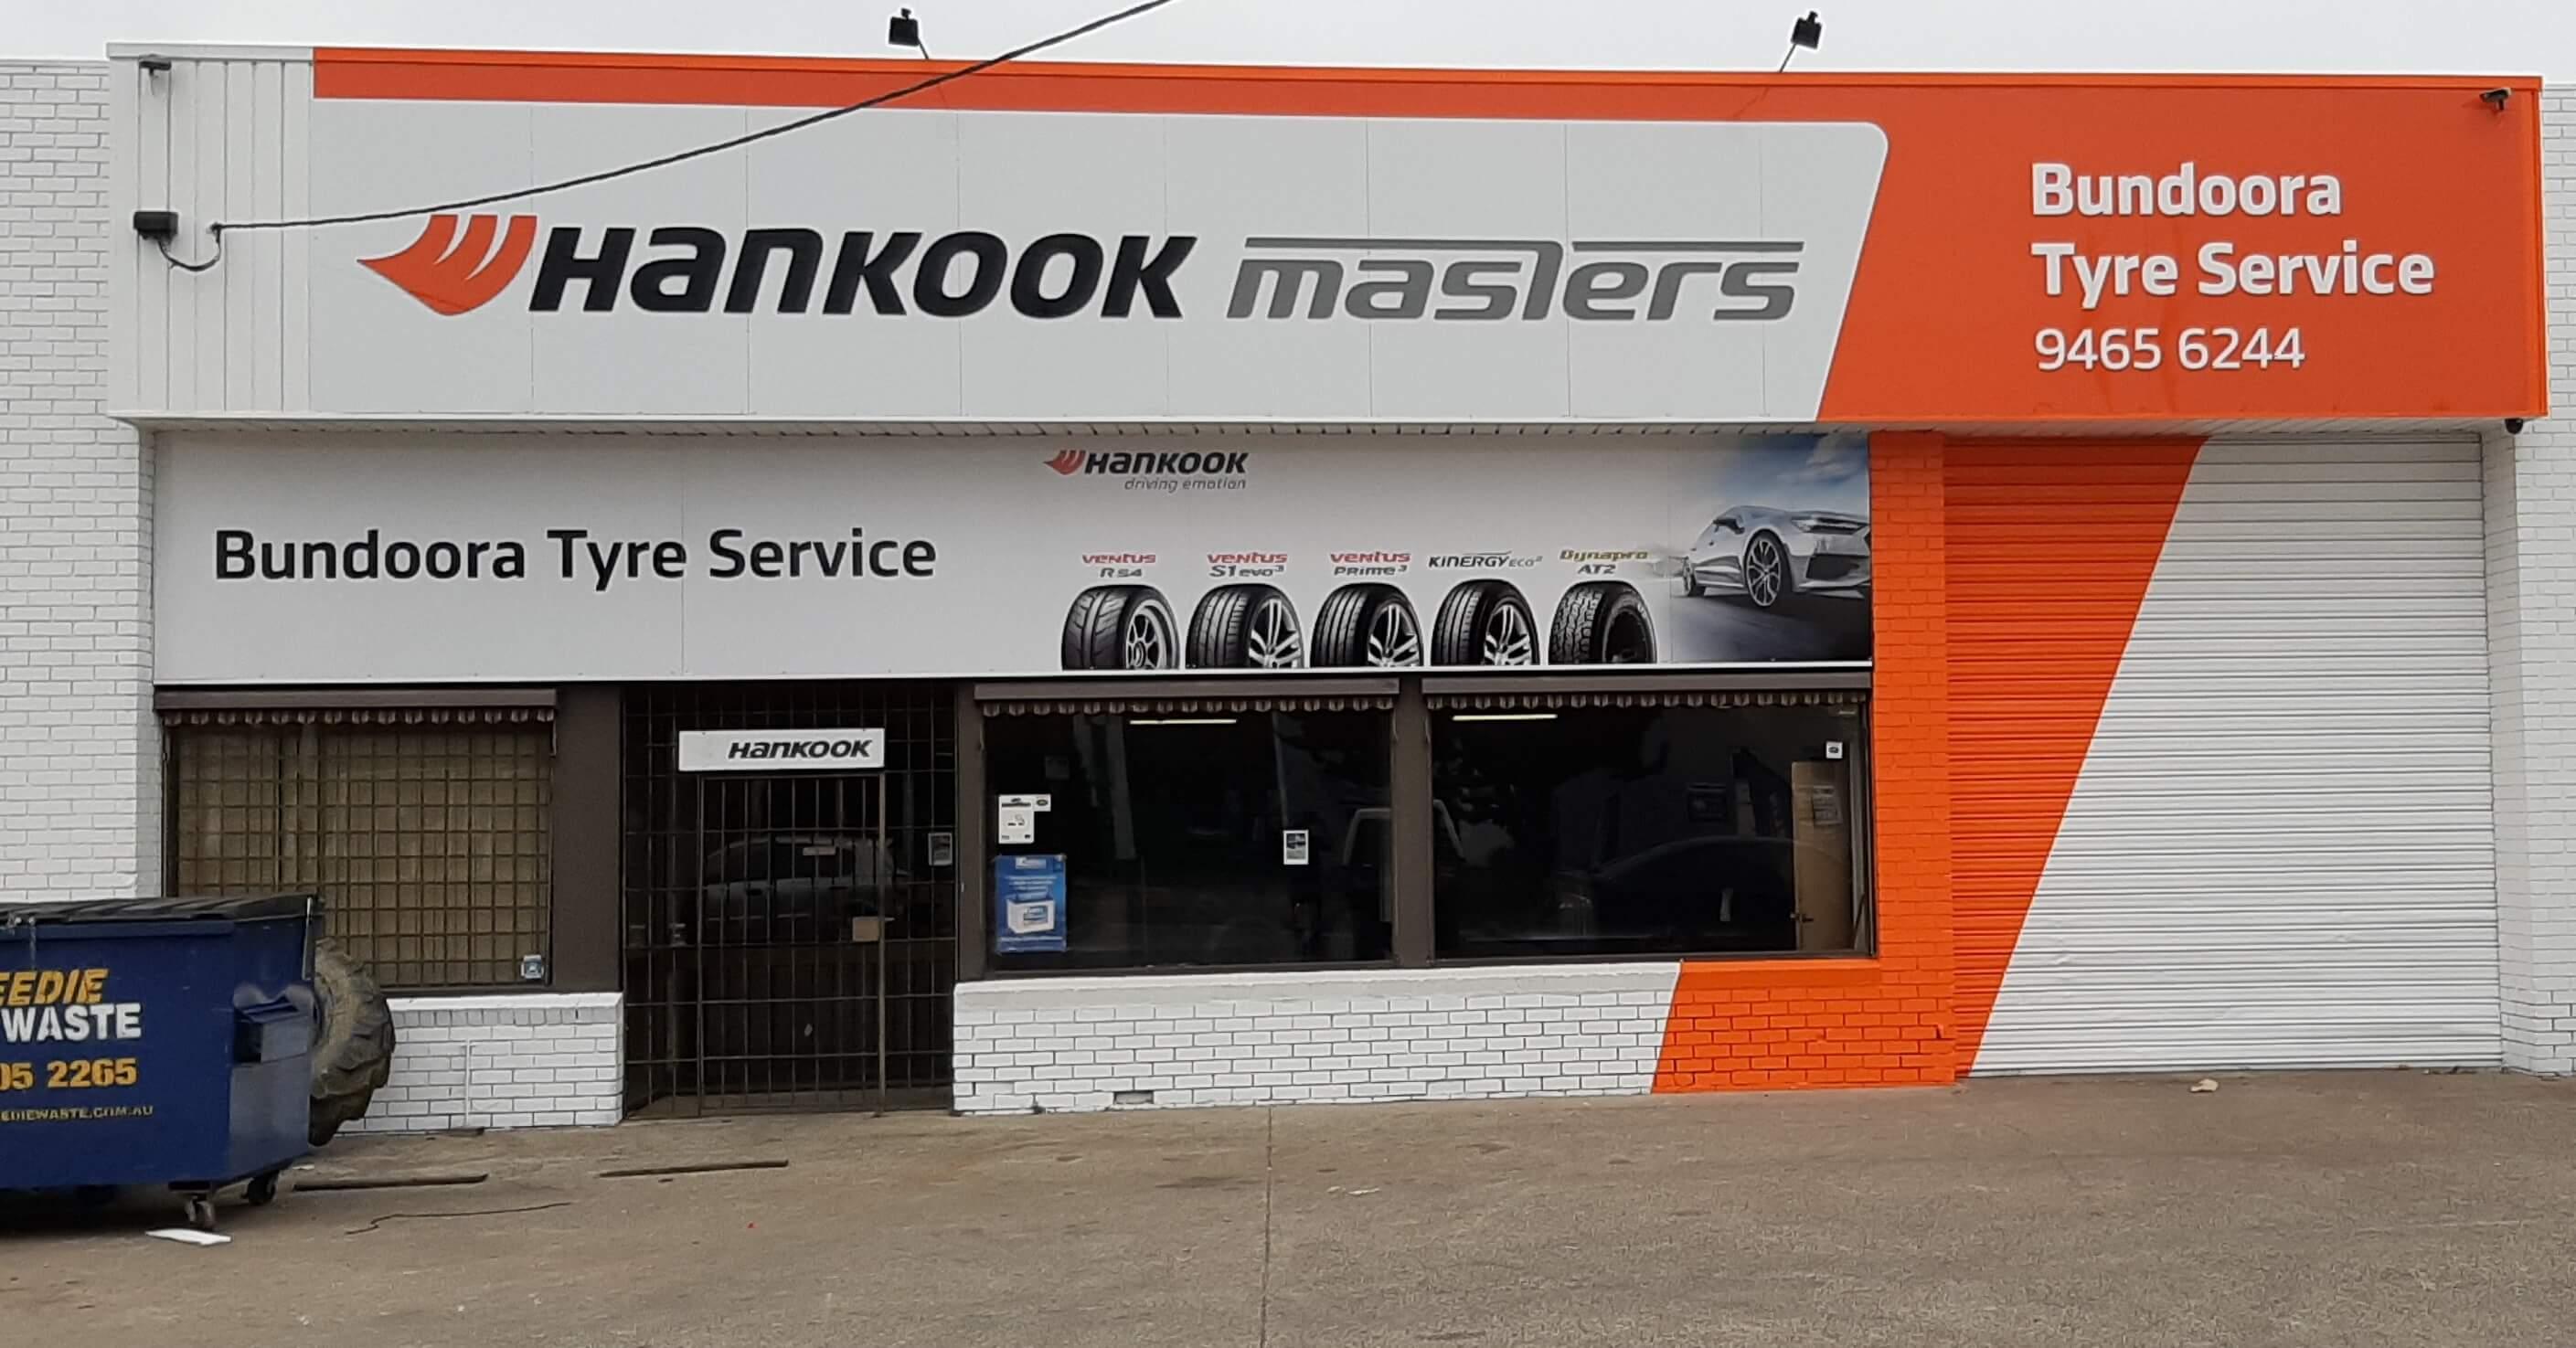 Bundoora Tyre Service - Hankook Masters